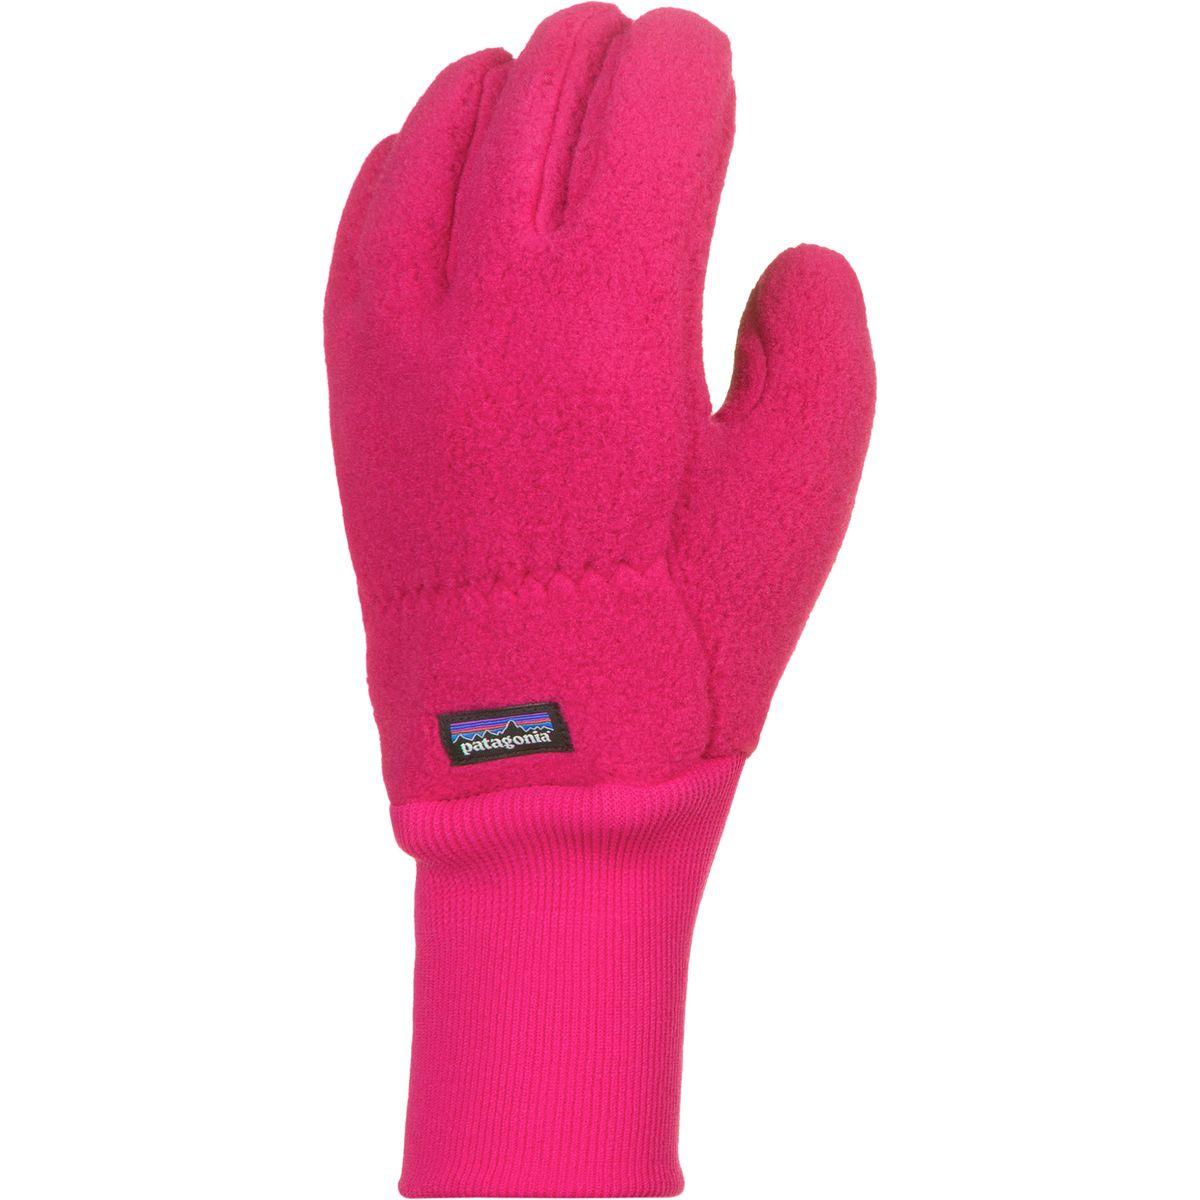 Patagonia Synchilla Glove - Kids